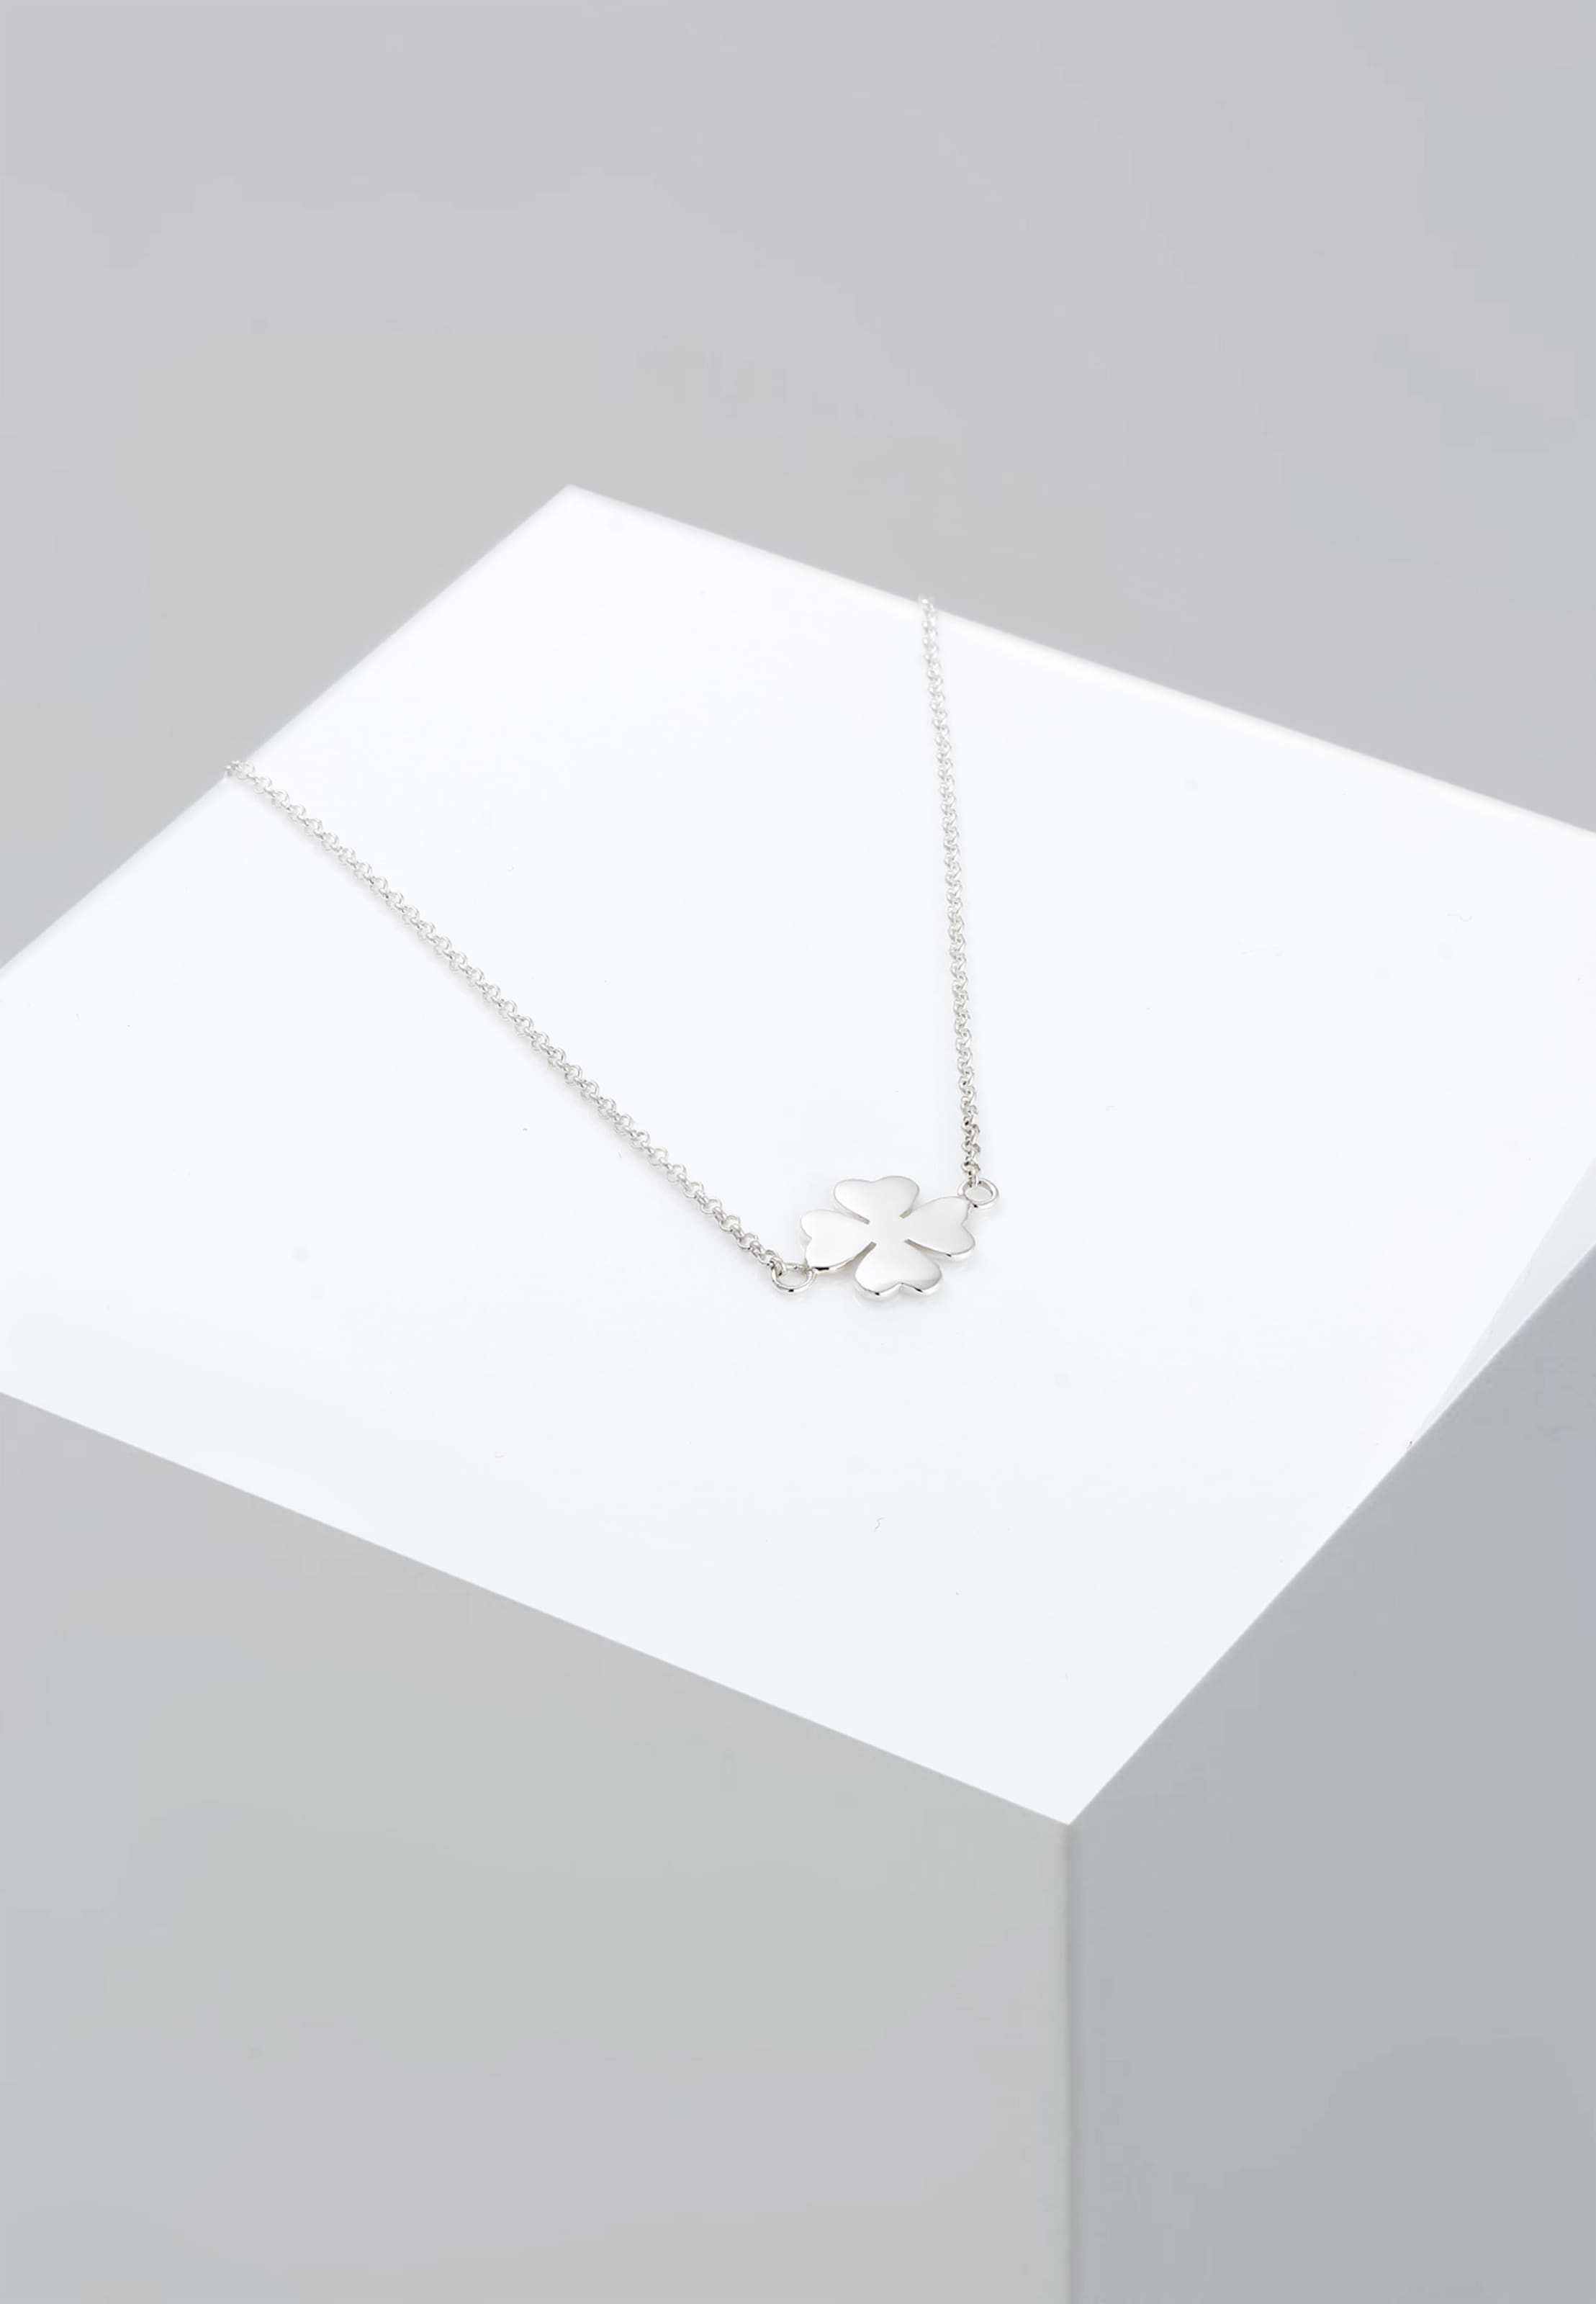 In Elli Silber 'kleeblatt' Halskette UzMSVGqp